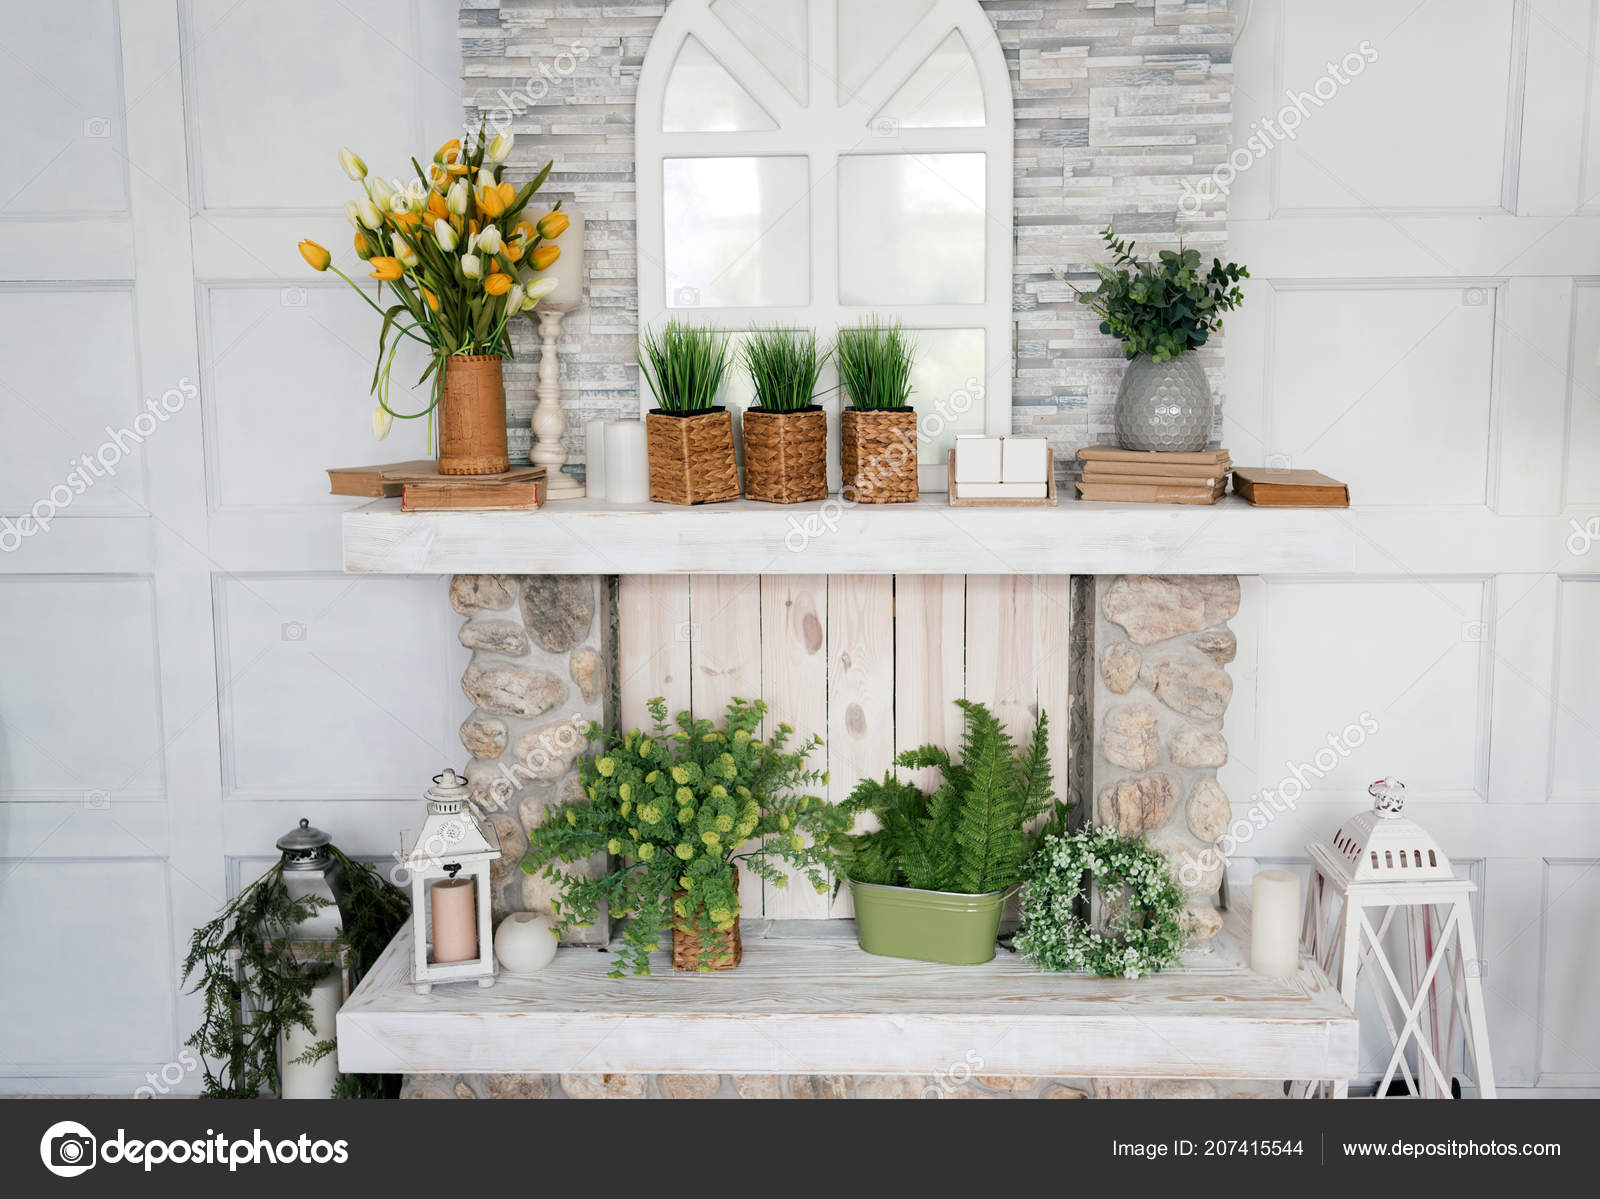 White Wooden Shelf Bouquet Tulips Grass Pot Greenery Vase